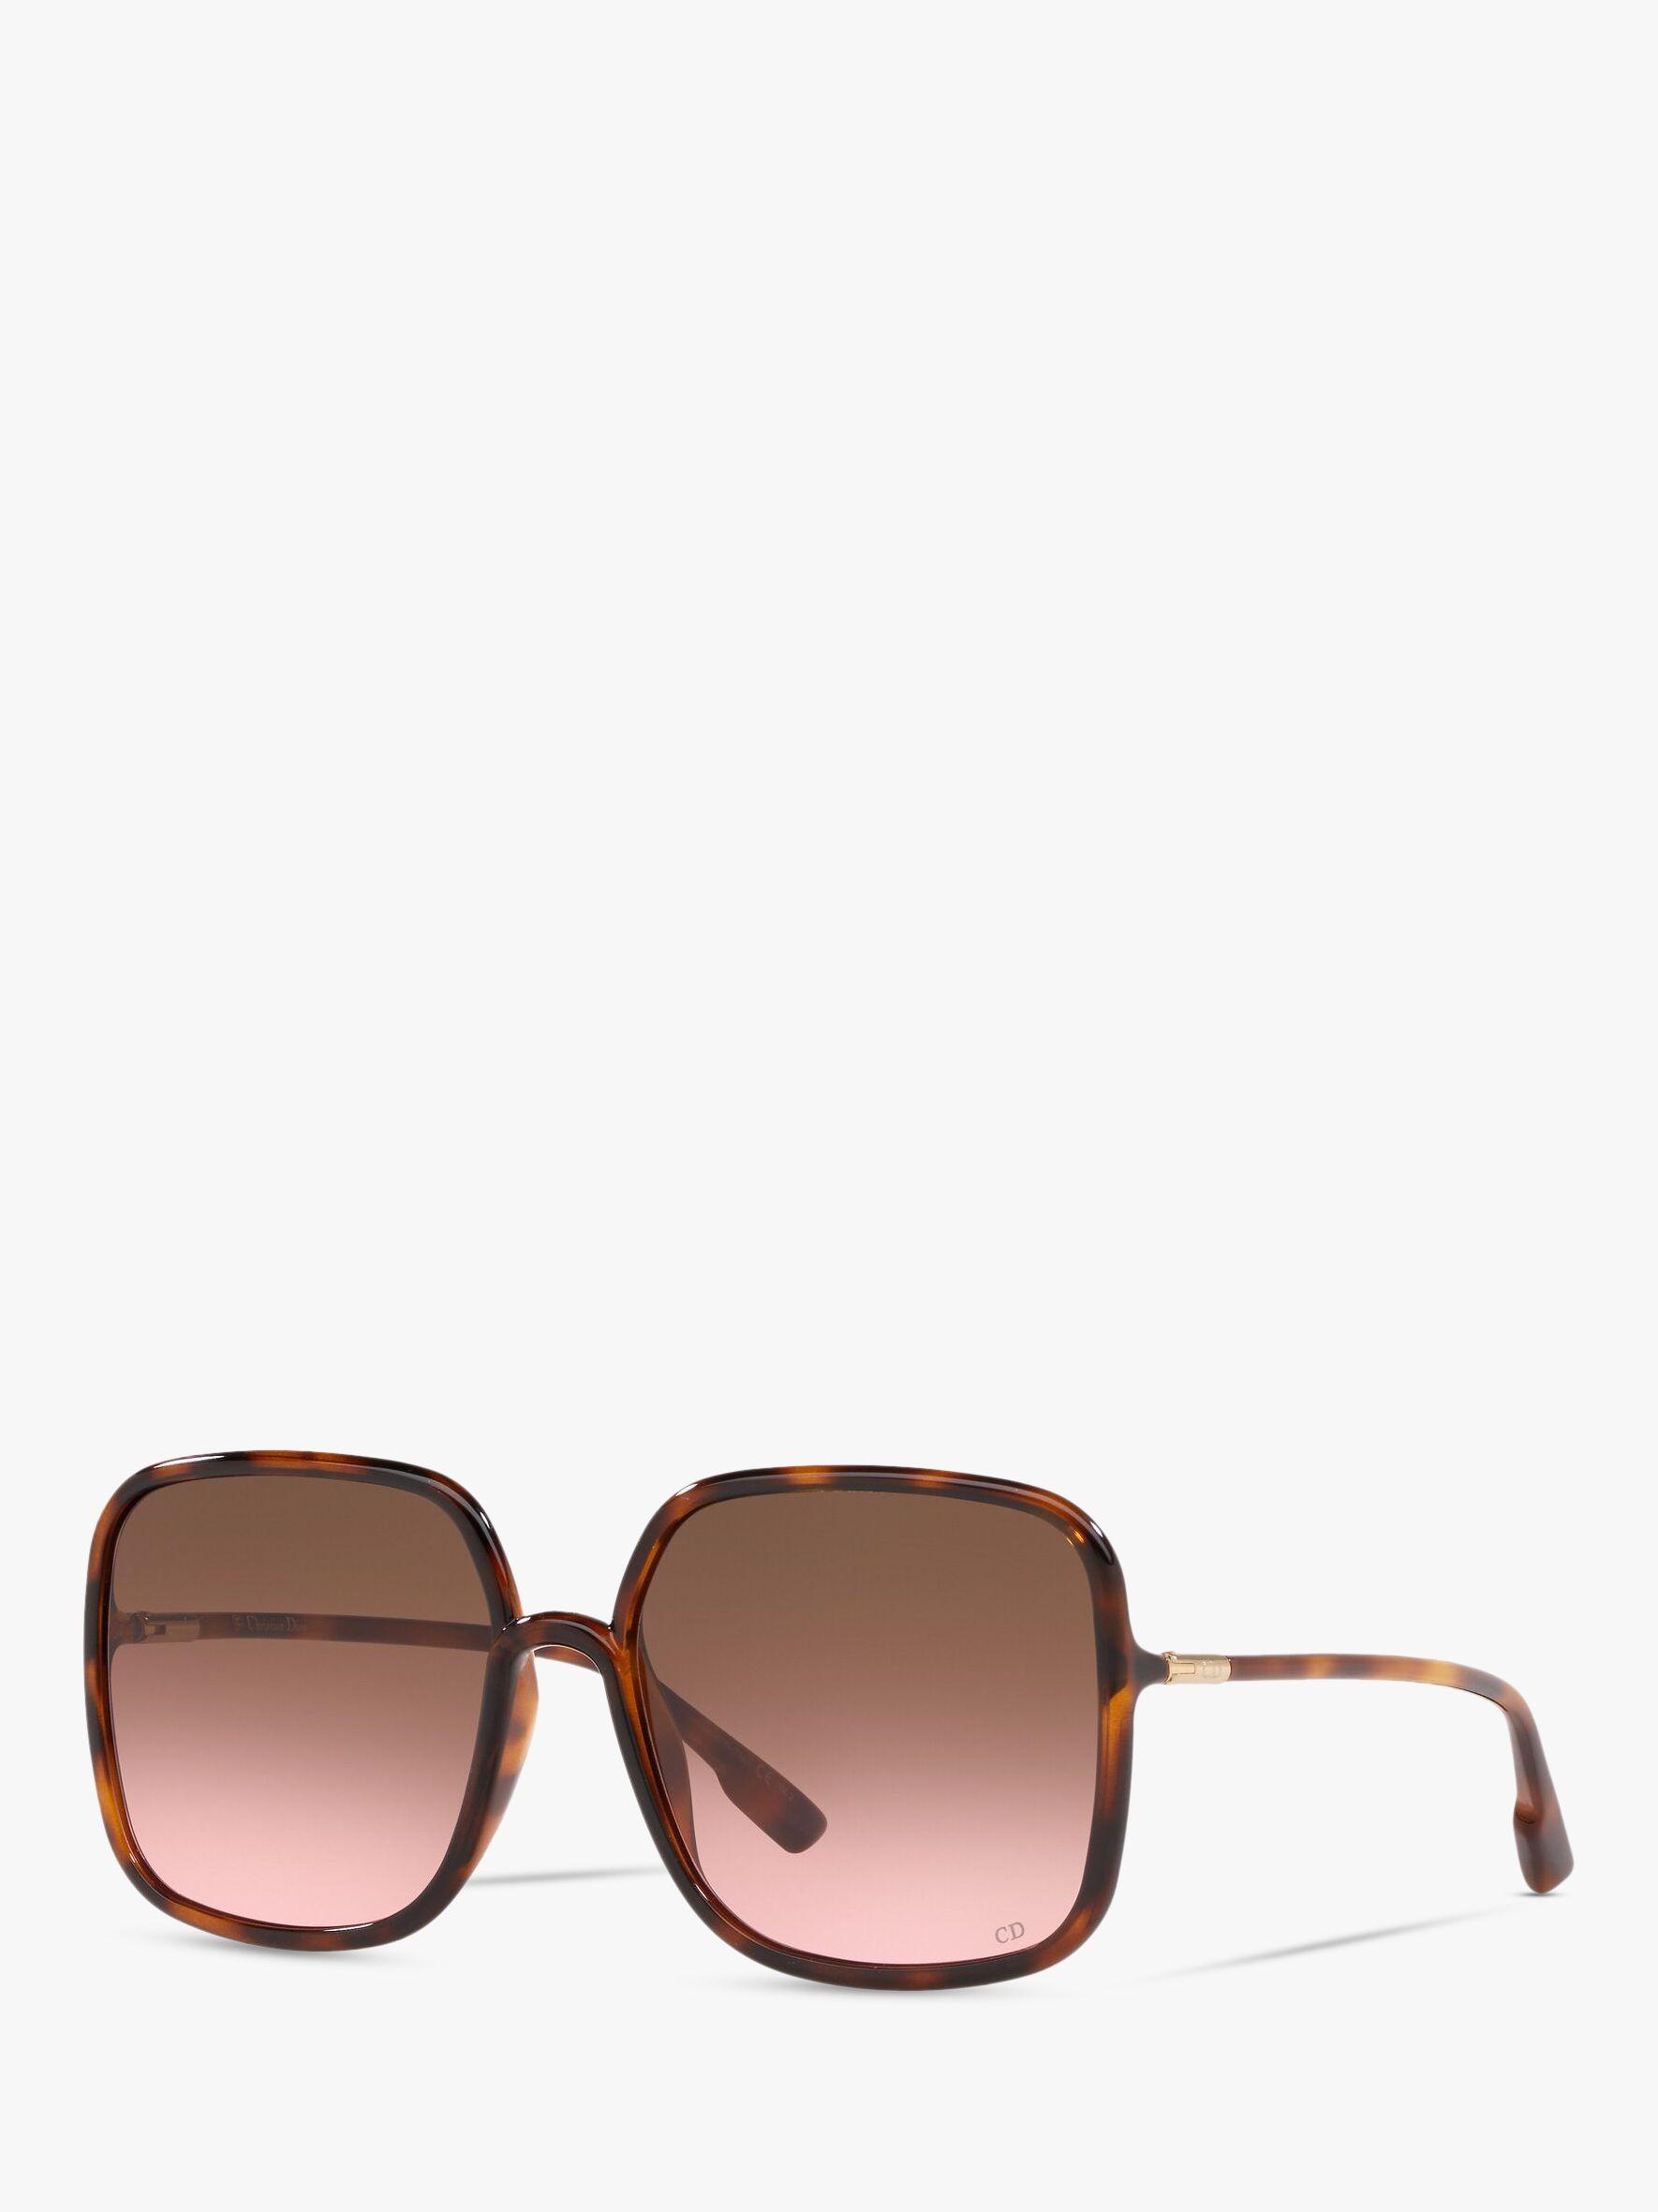 c436c909681b Dior Sostellaire1 Women's Square Sunglasses at John Lewis & Partners